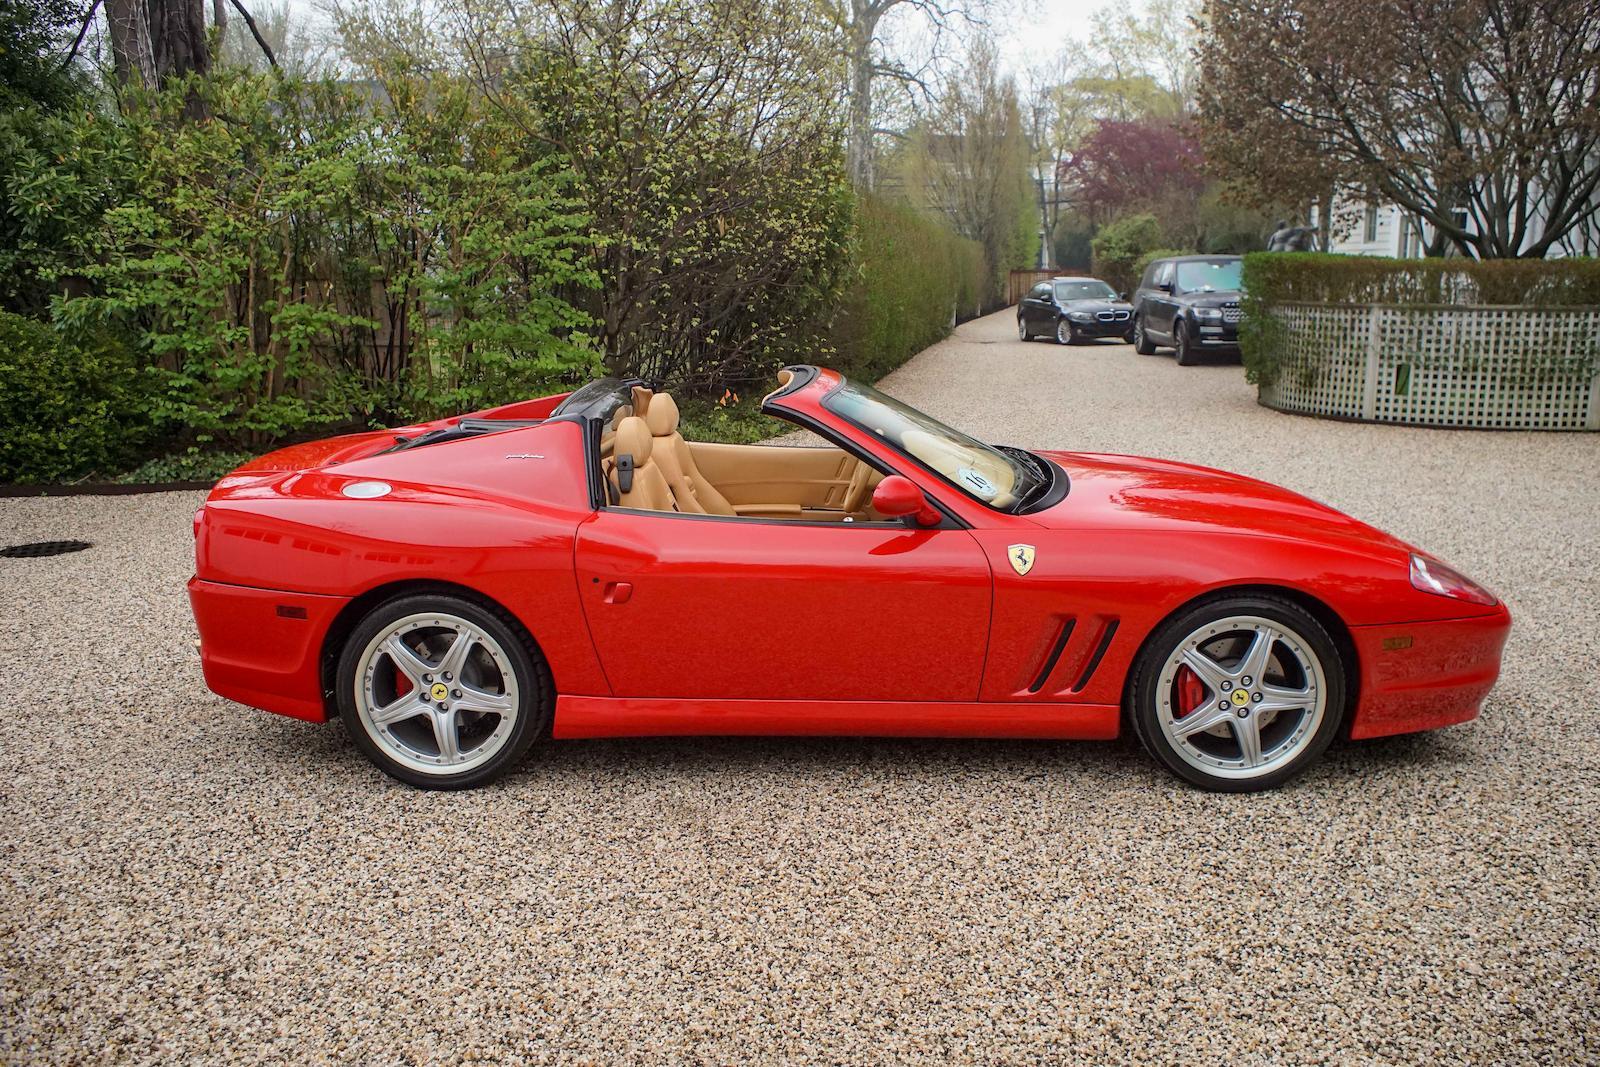 Ferrari 575m Superamerica Estimated To Fetch Up To 900 000 At Auction Autoevolution